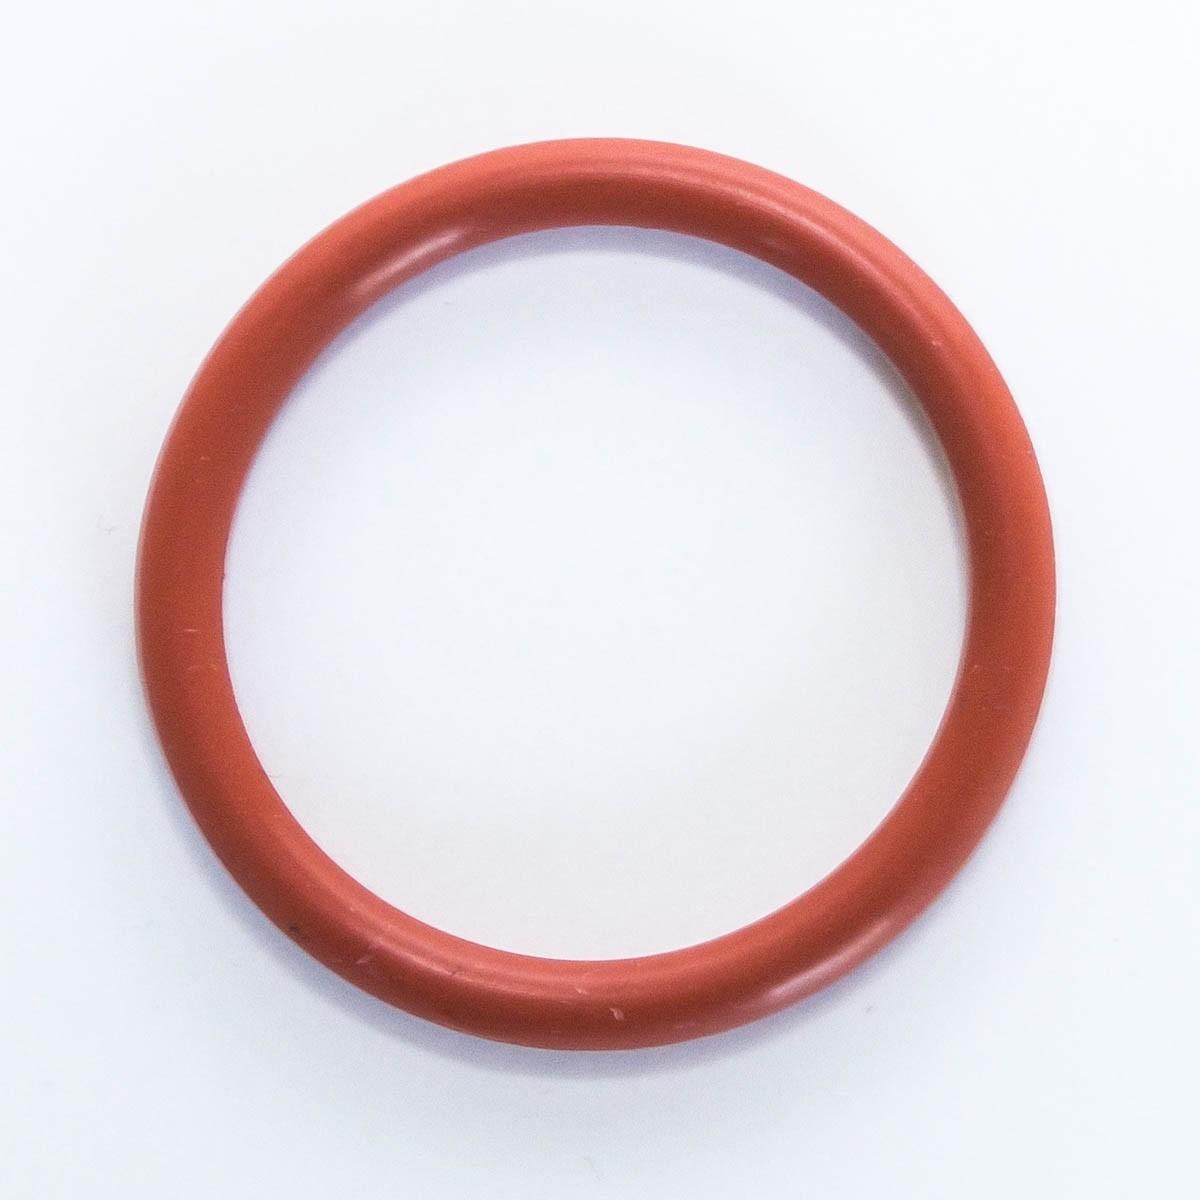 o ring shop t s 001069 45 020 o ring t s 036l nsf listed. Black Bedroom Furniture Sets. Home Design Ideas